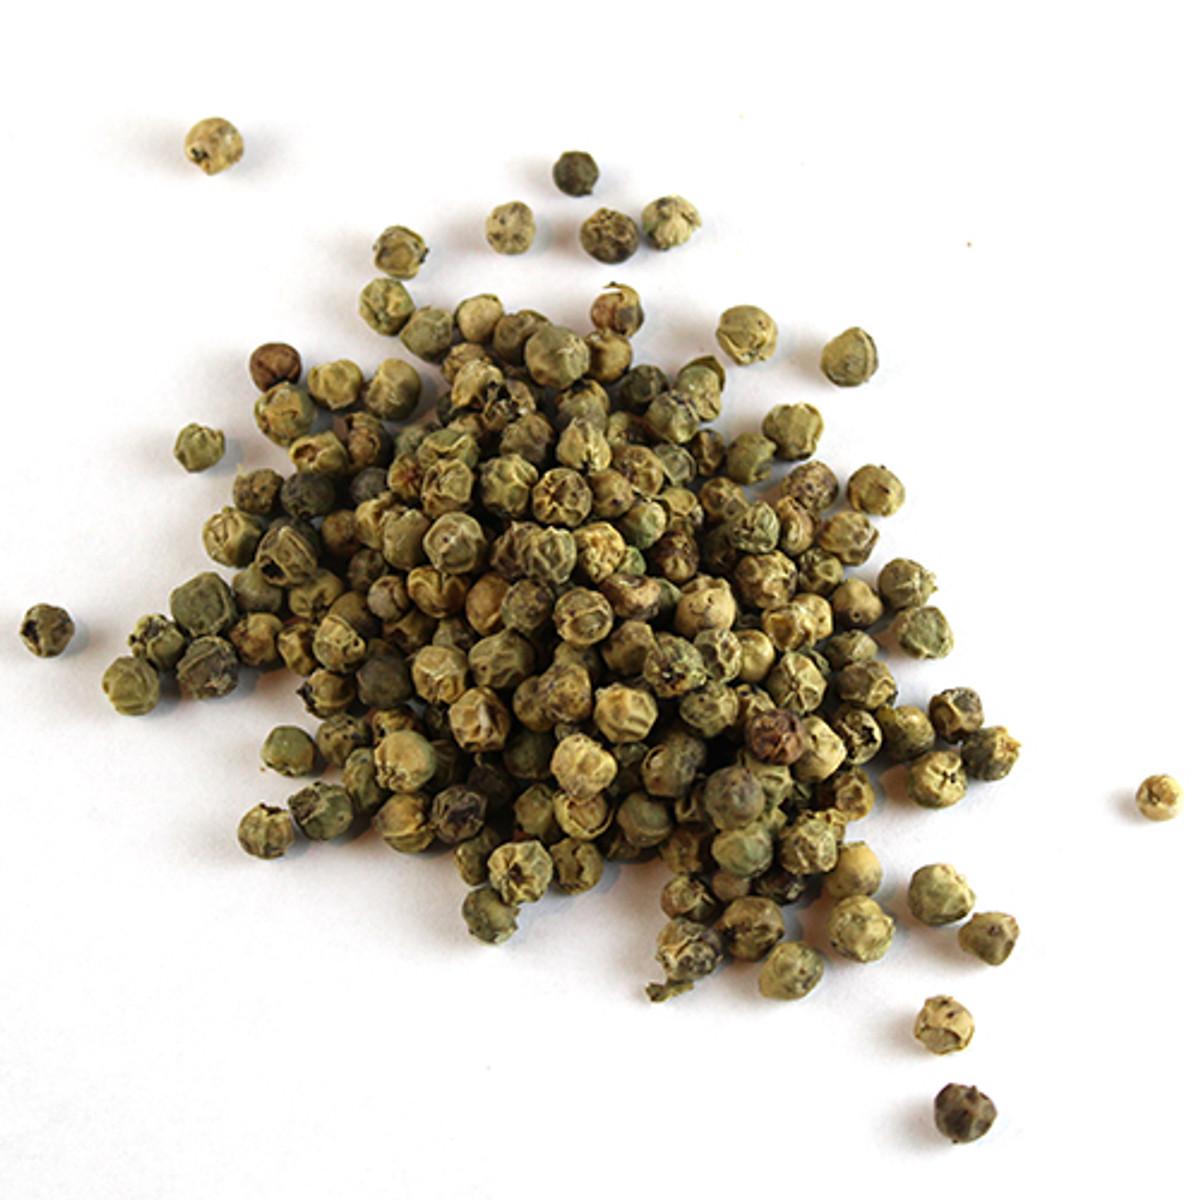 Green Peppercorn - Whole